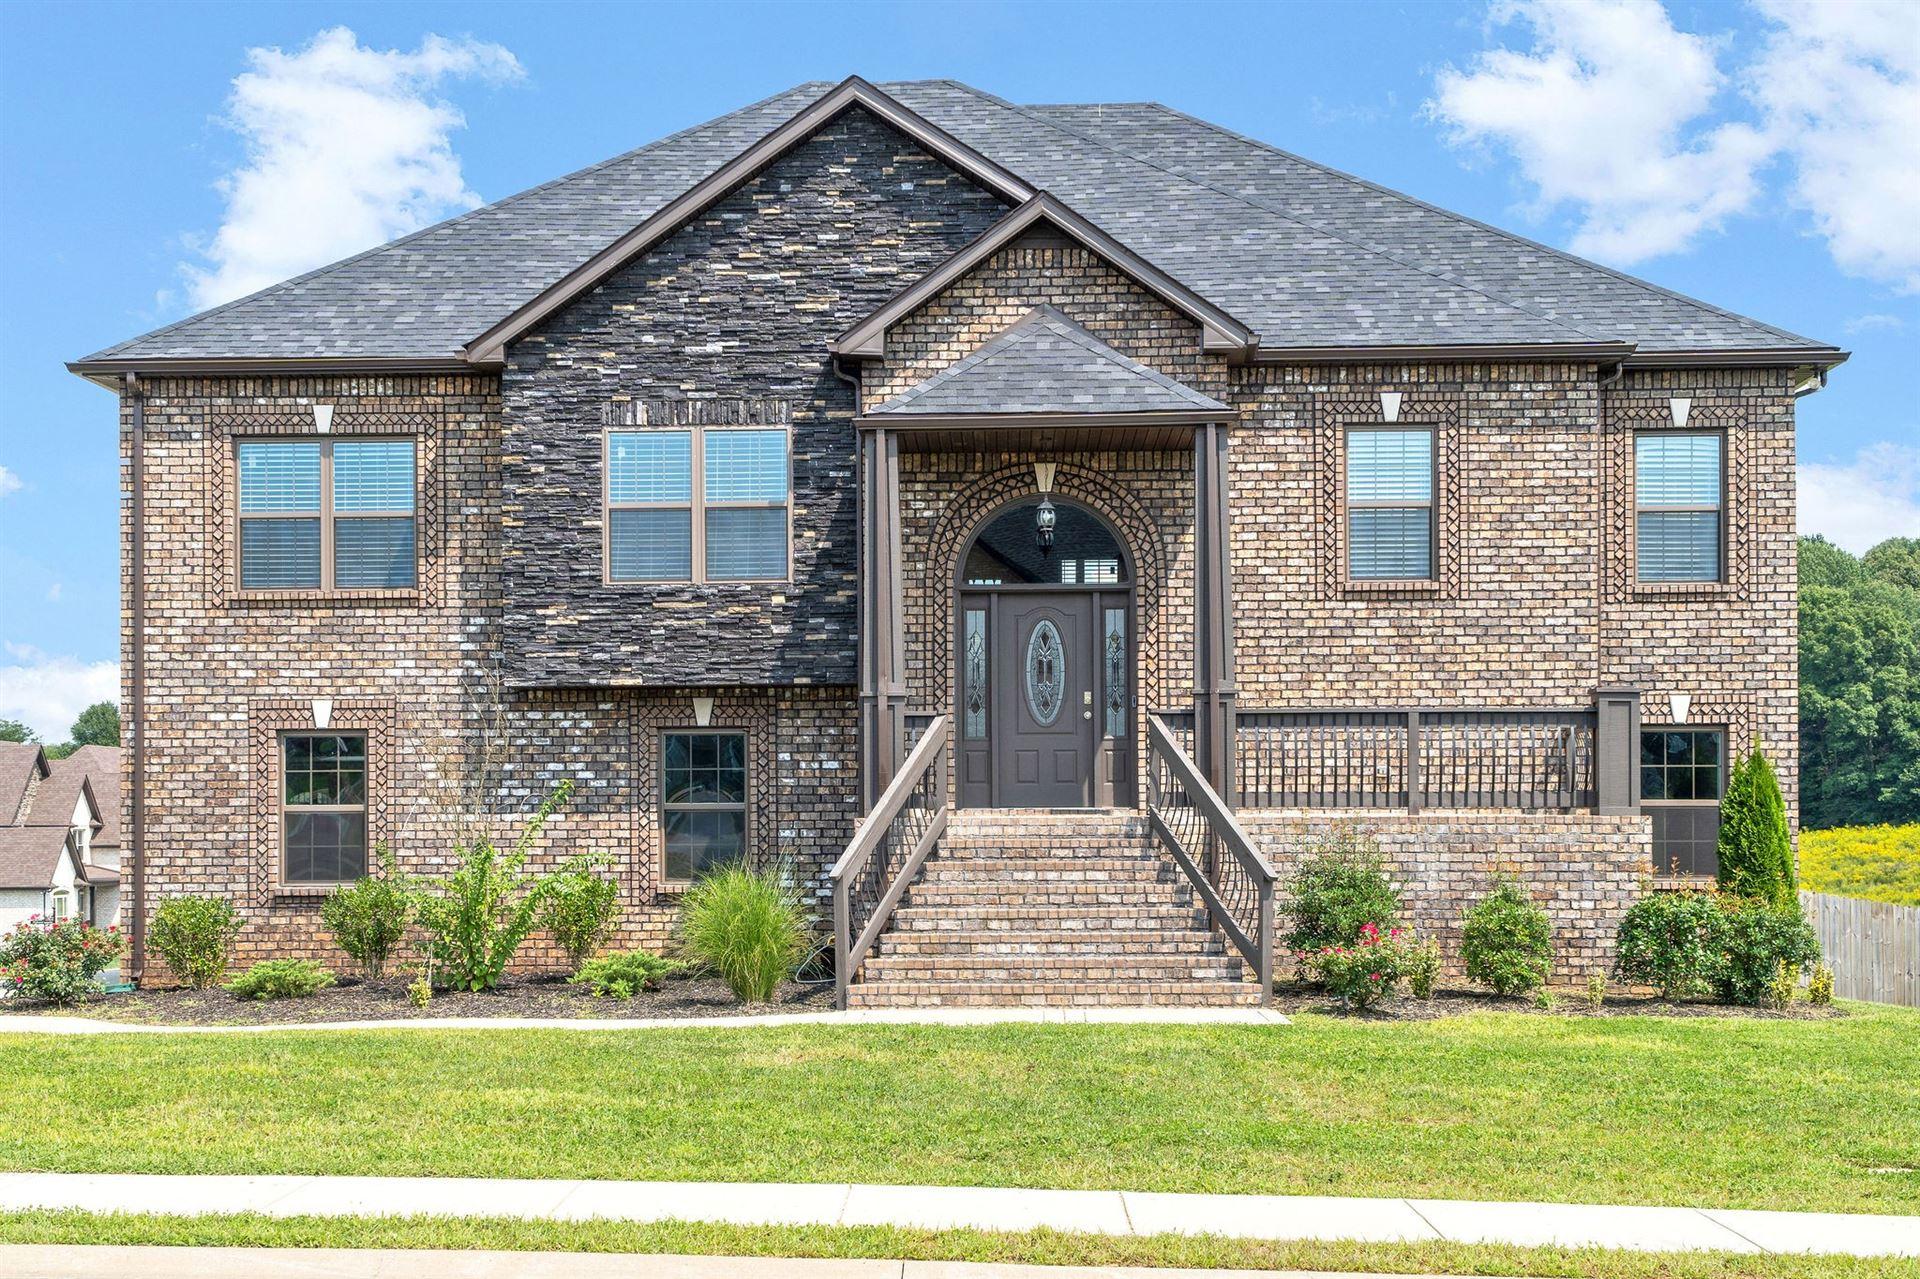 2597 Remington Trce, Clarksville, TN 37043 - MLS#: 2188001